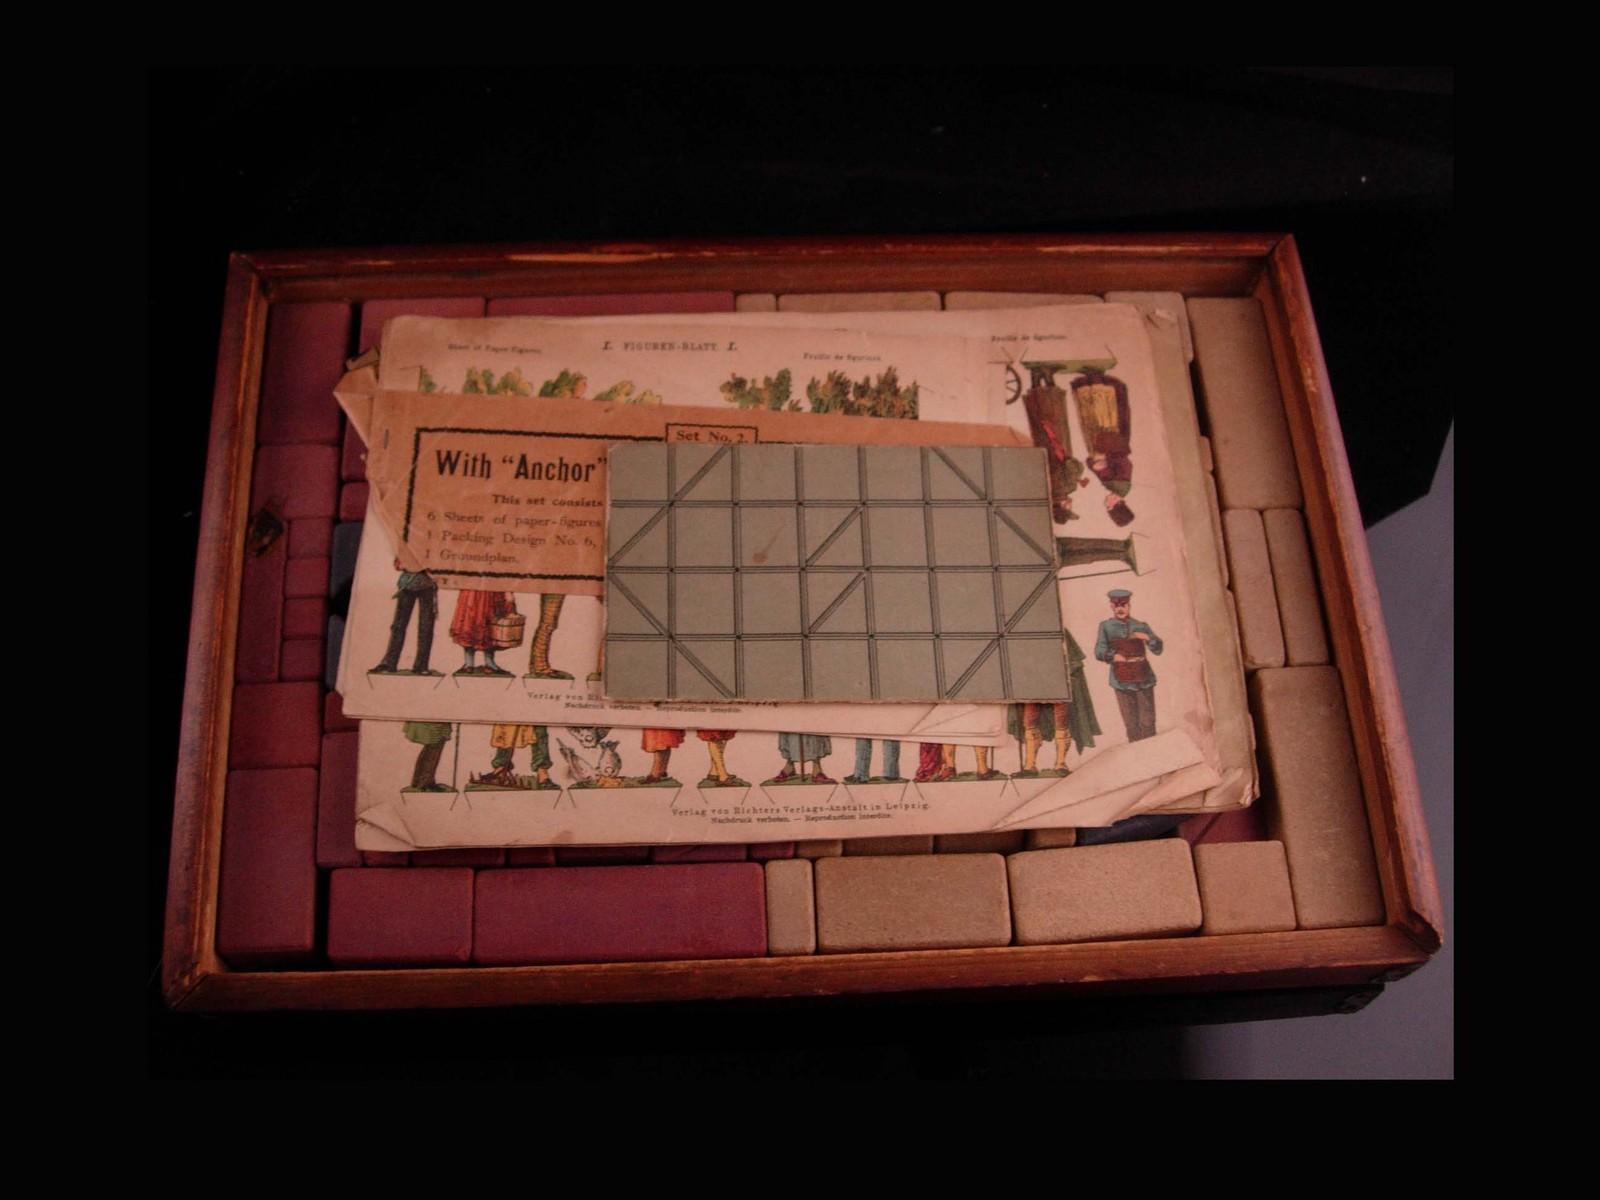 1911  building blocks set - Anchor Stone Blocks - Antique Toy - classic vintage